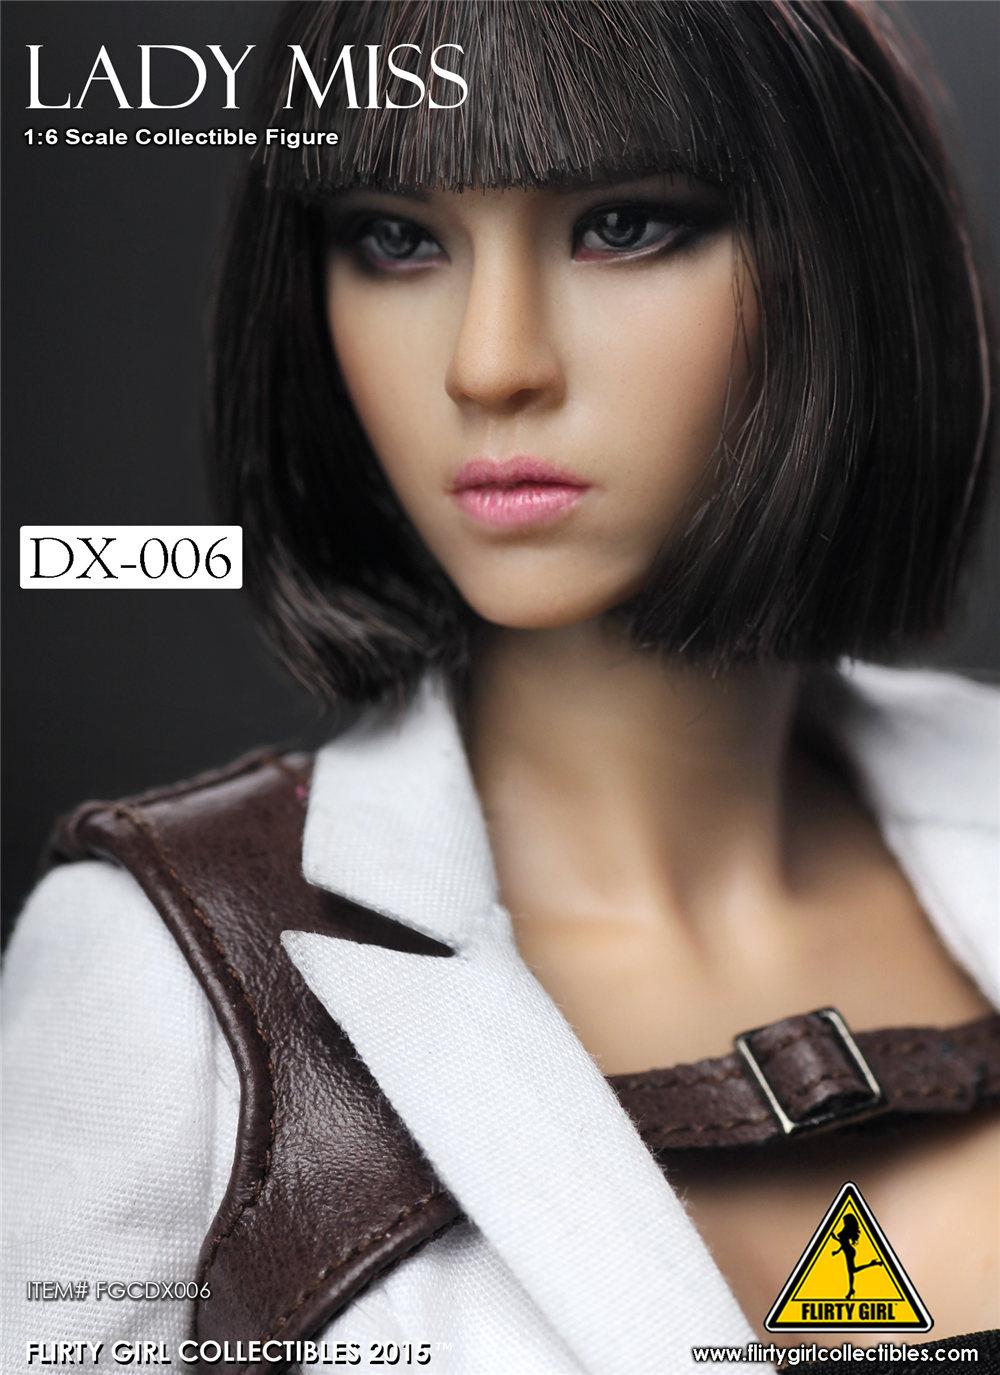 http://3.bp.blogspot.com/-ueLO0RlZfaI/VXP2LfQP05I/AAAAAAAAjQA/AE0EKfkm0l0/s1640/f8.jpg